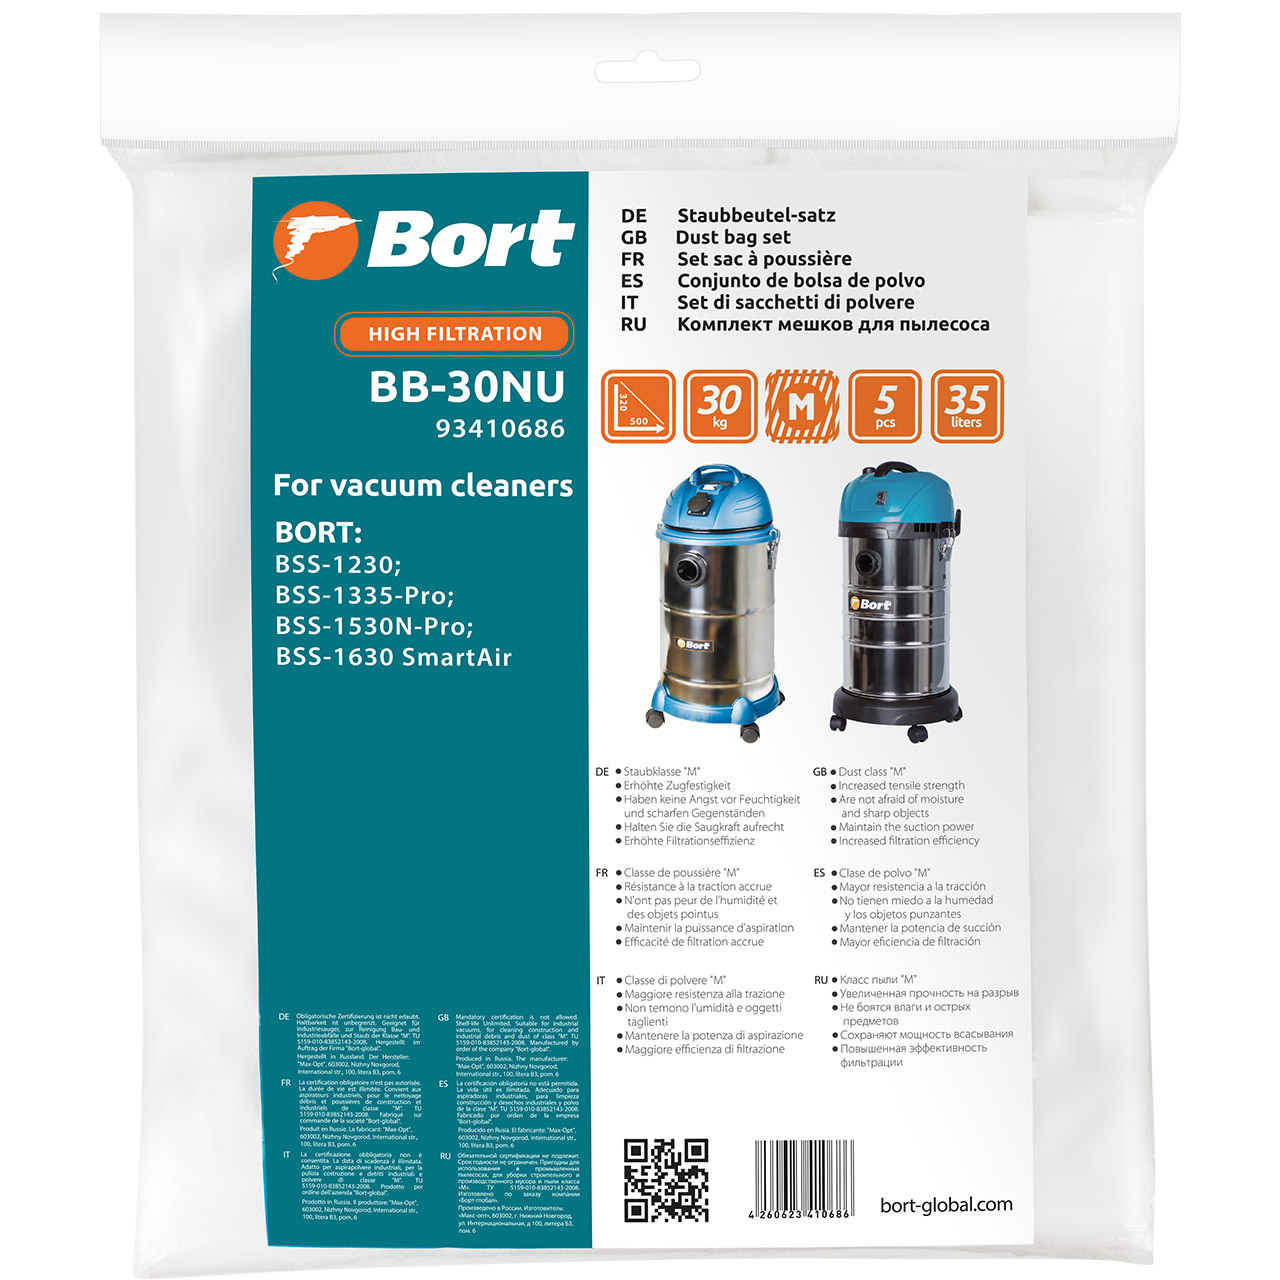 Kit bags пылесборных for vacuum cleaner Bort BB-30NU (5 pcs, volume 35L, BSS-1230; BSS-1335-Pro; BSS-1530N-Pro; BSS-1630S цена и фото